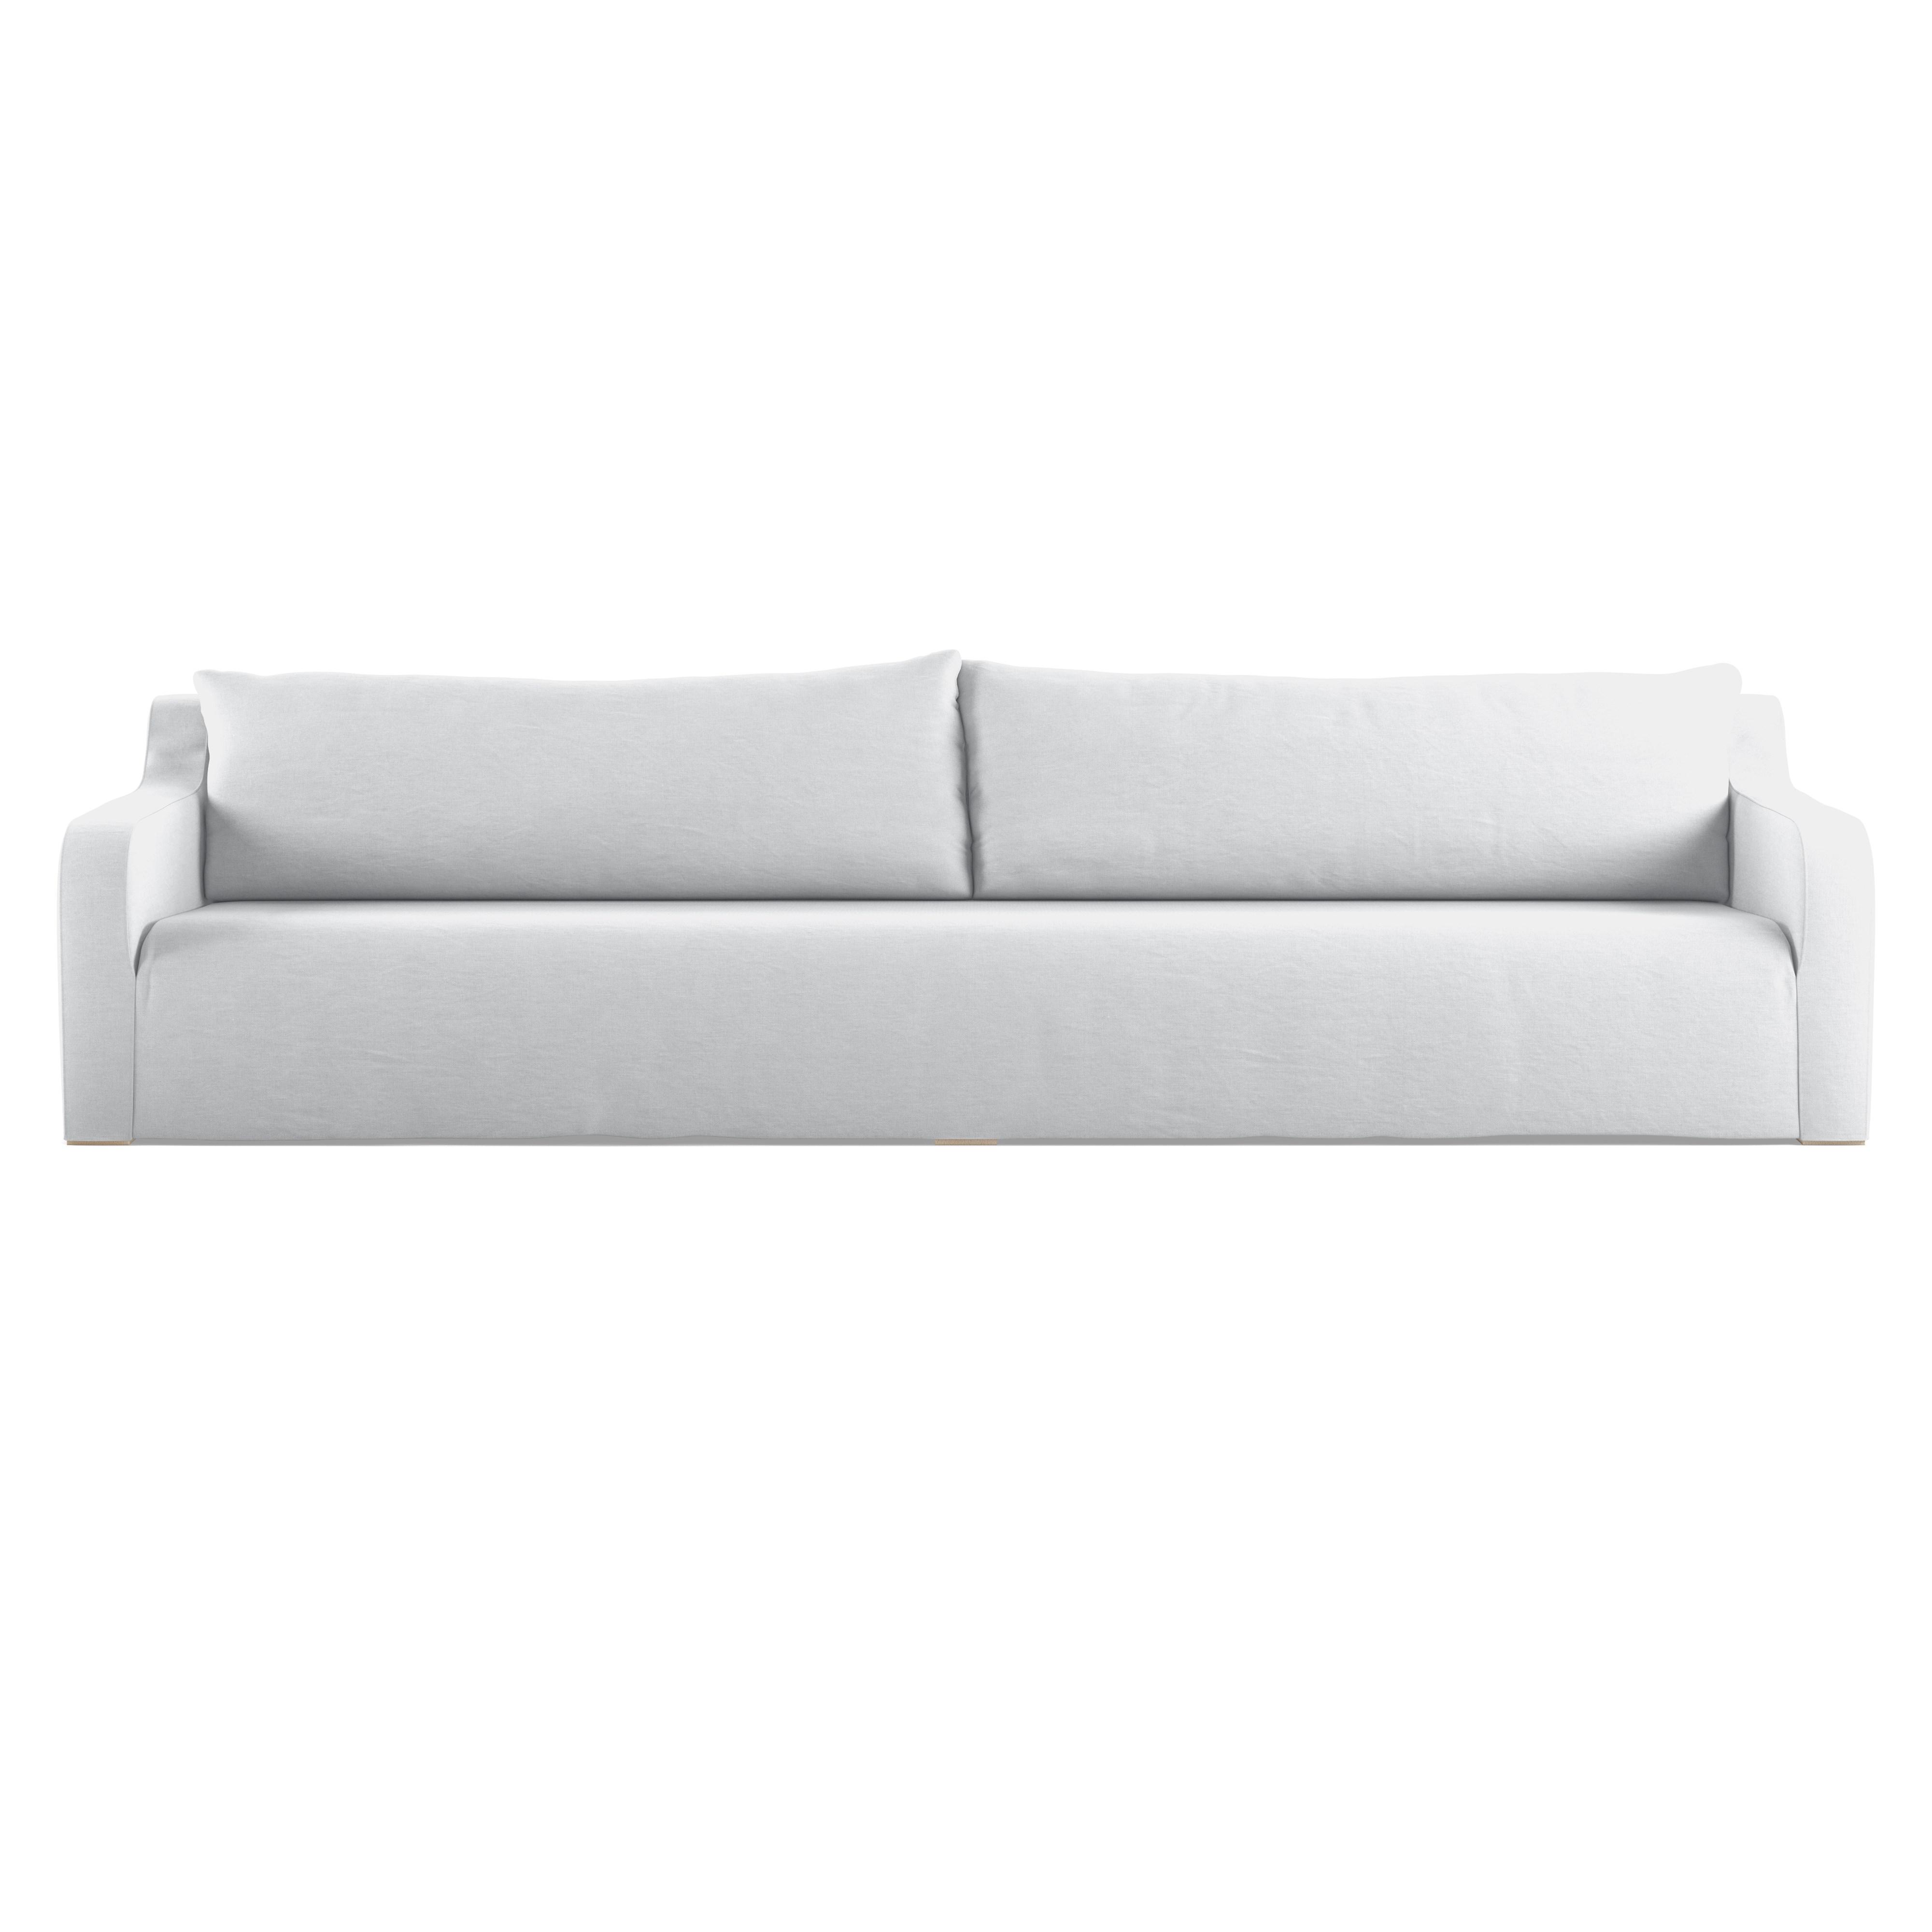 Sofasoft Xl Ica White Products